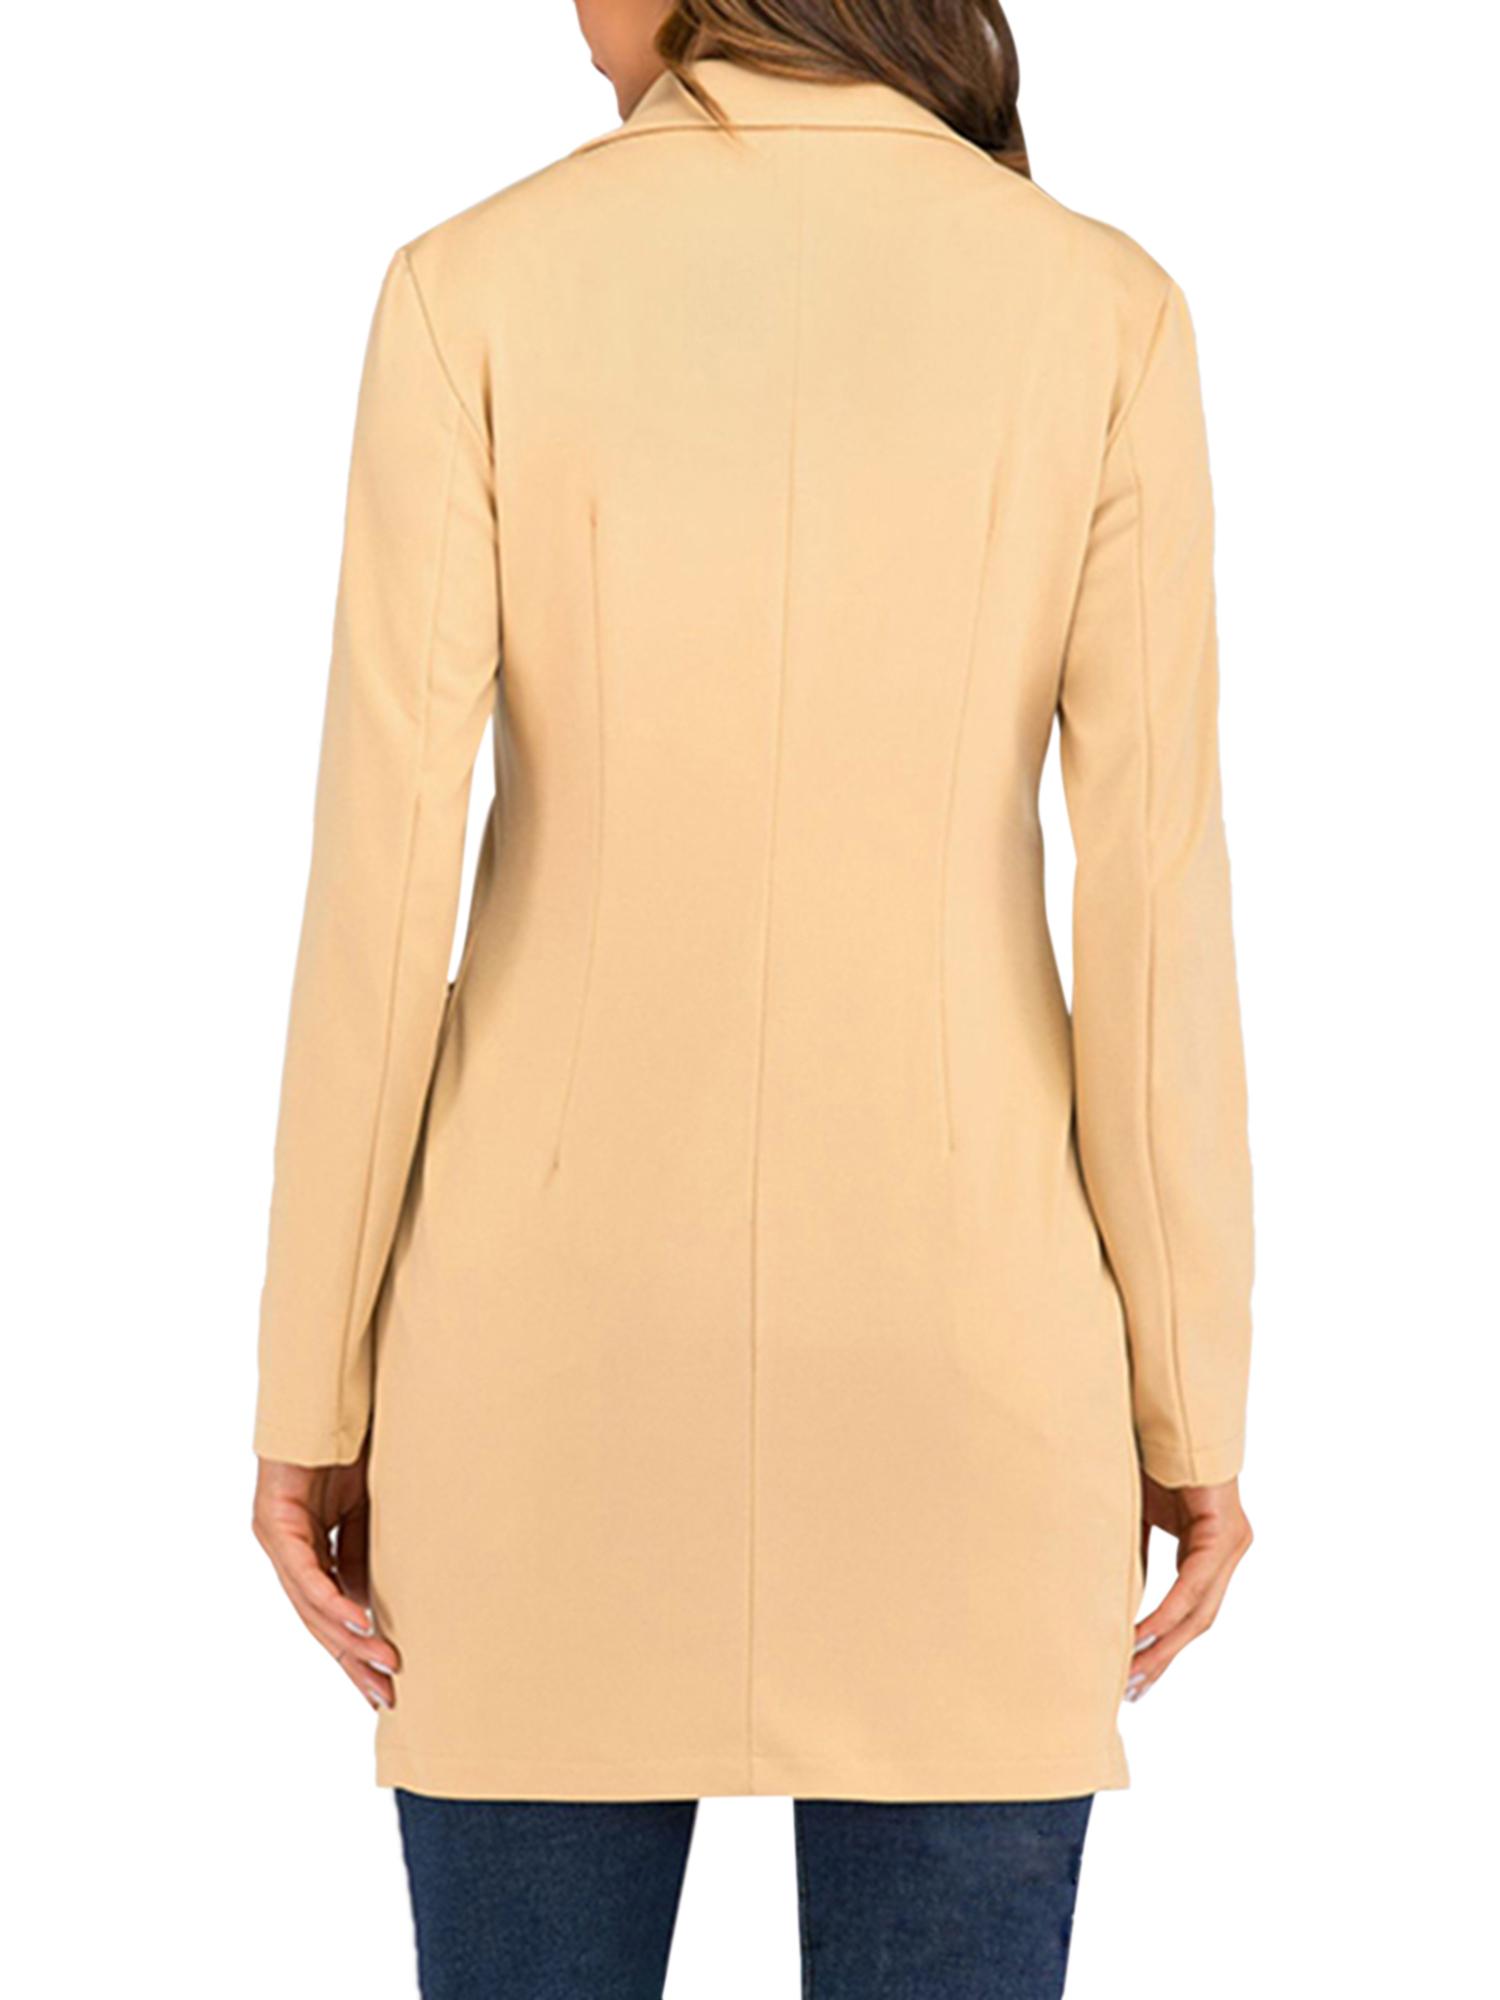 Vintage-Women-Double-Breasted-Plaid-Long-Blazer-Ladies-Jackets-Suits-Coat-Pocket miniatura 38